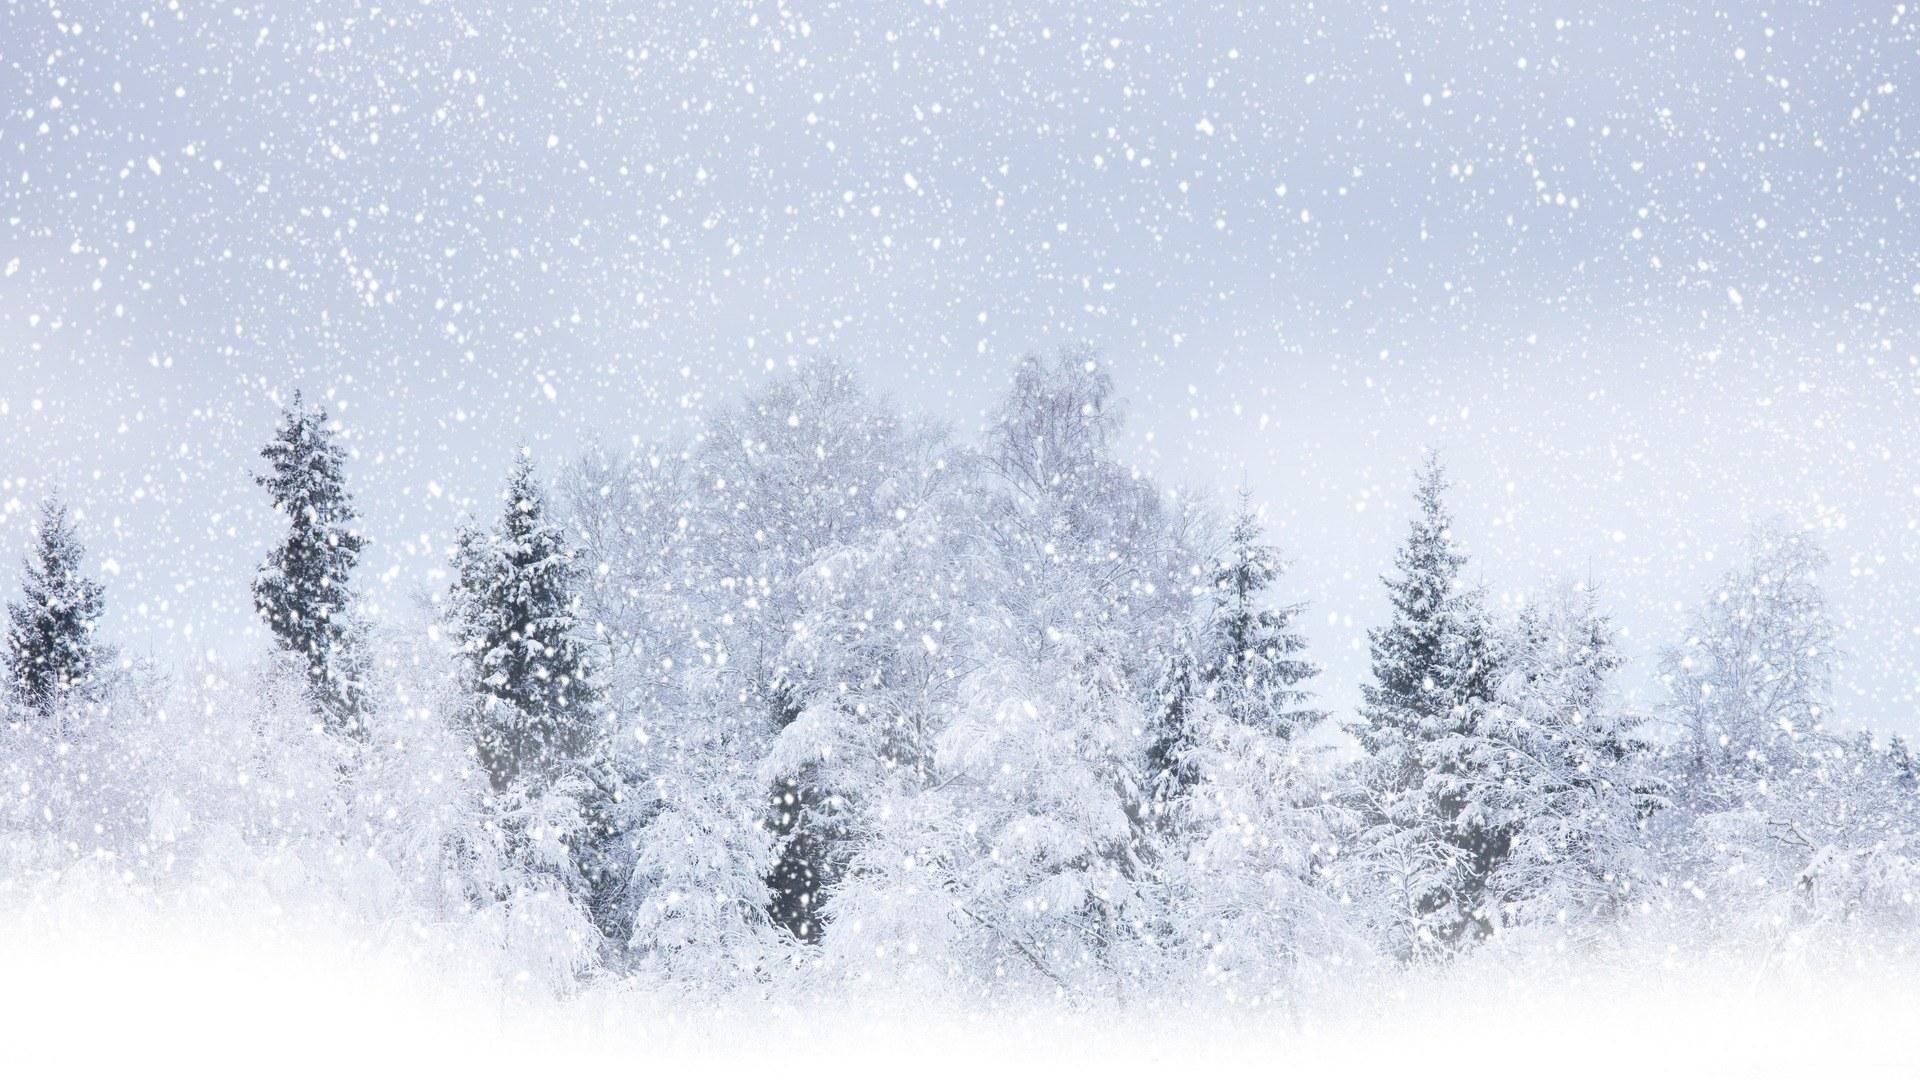 Snowfall Winter Precipitation Http Www Wallpapers4u Org Snowfall Winter Precipitation Snowfall Wallpaper Snow Blizzard Snow Storm